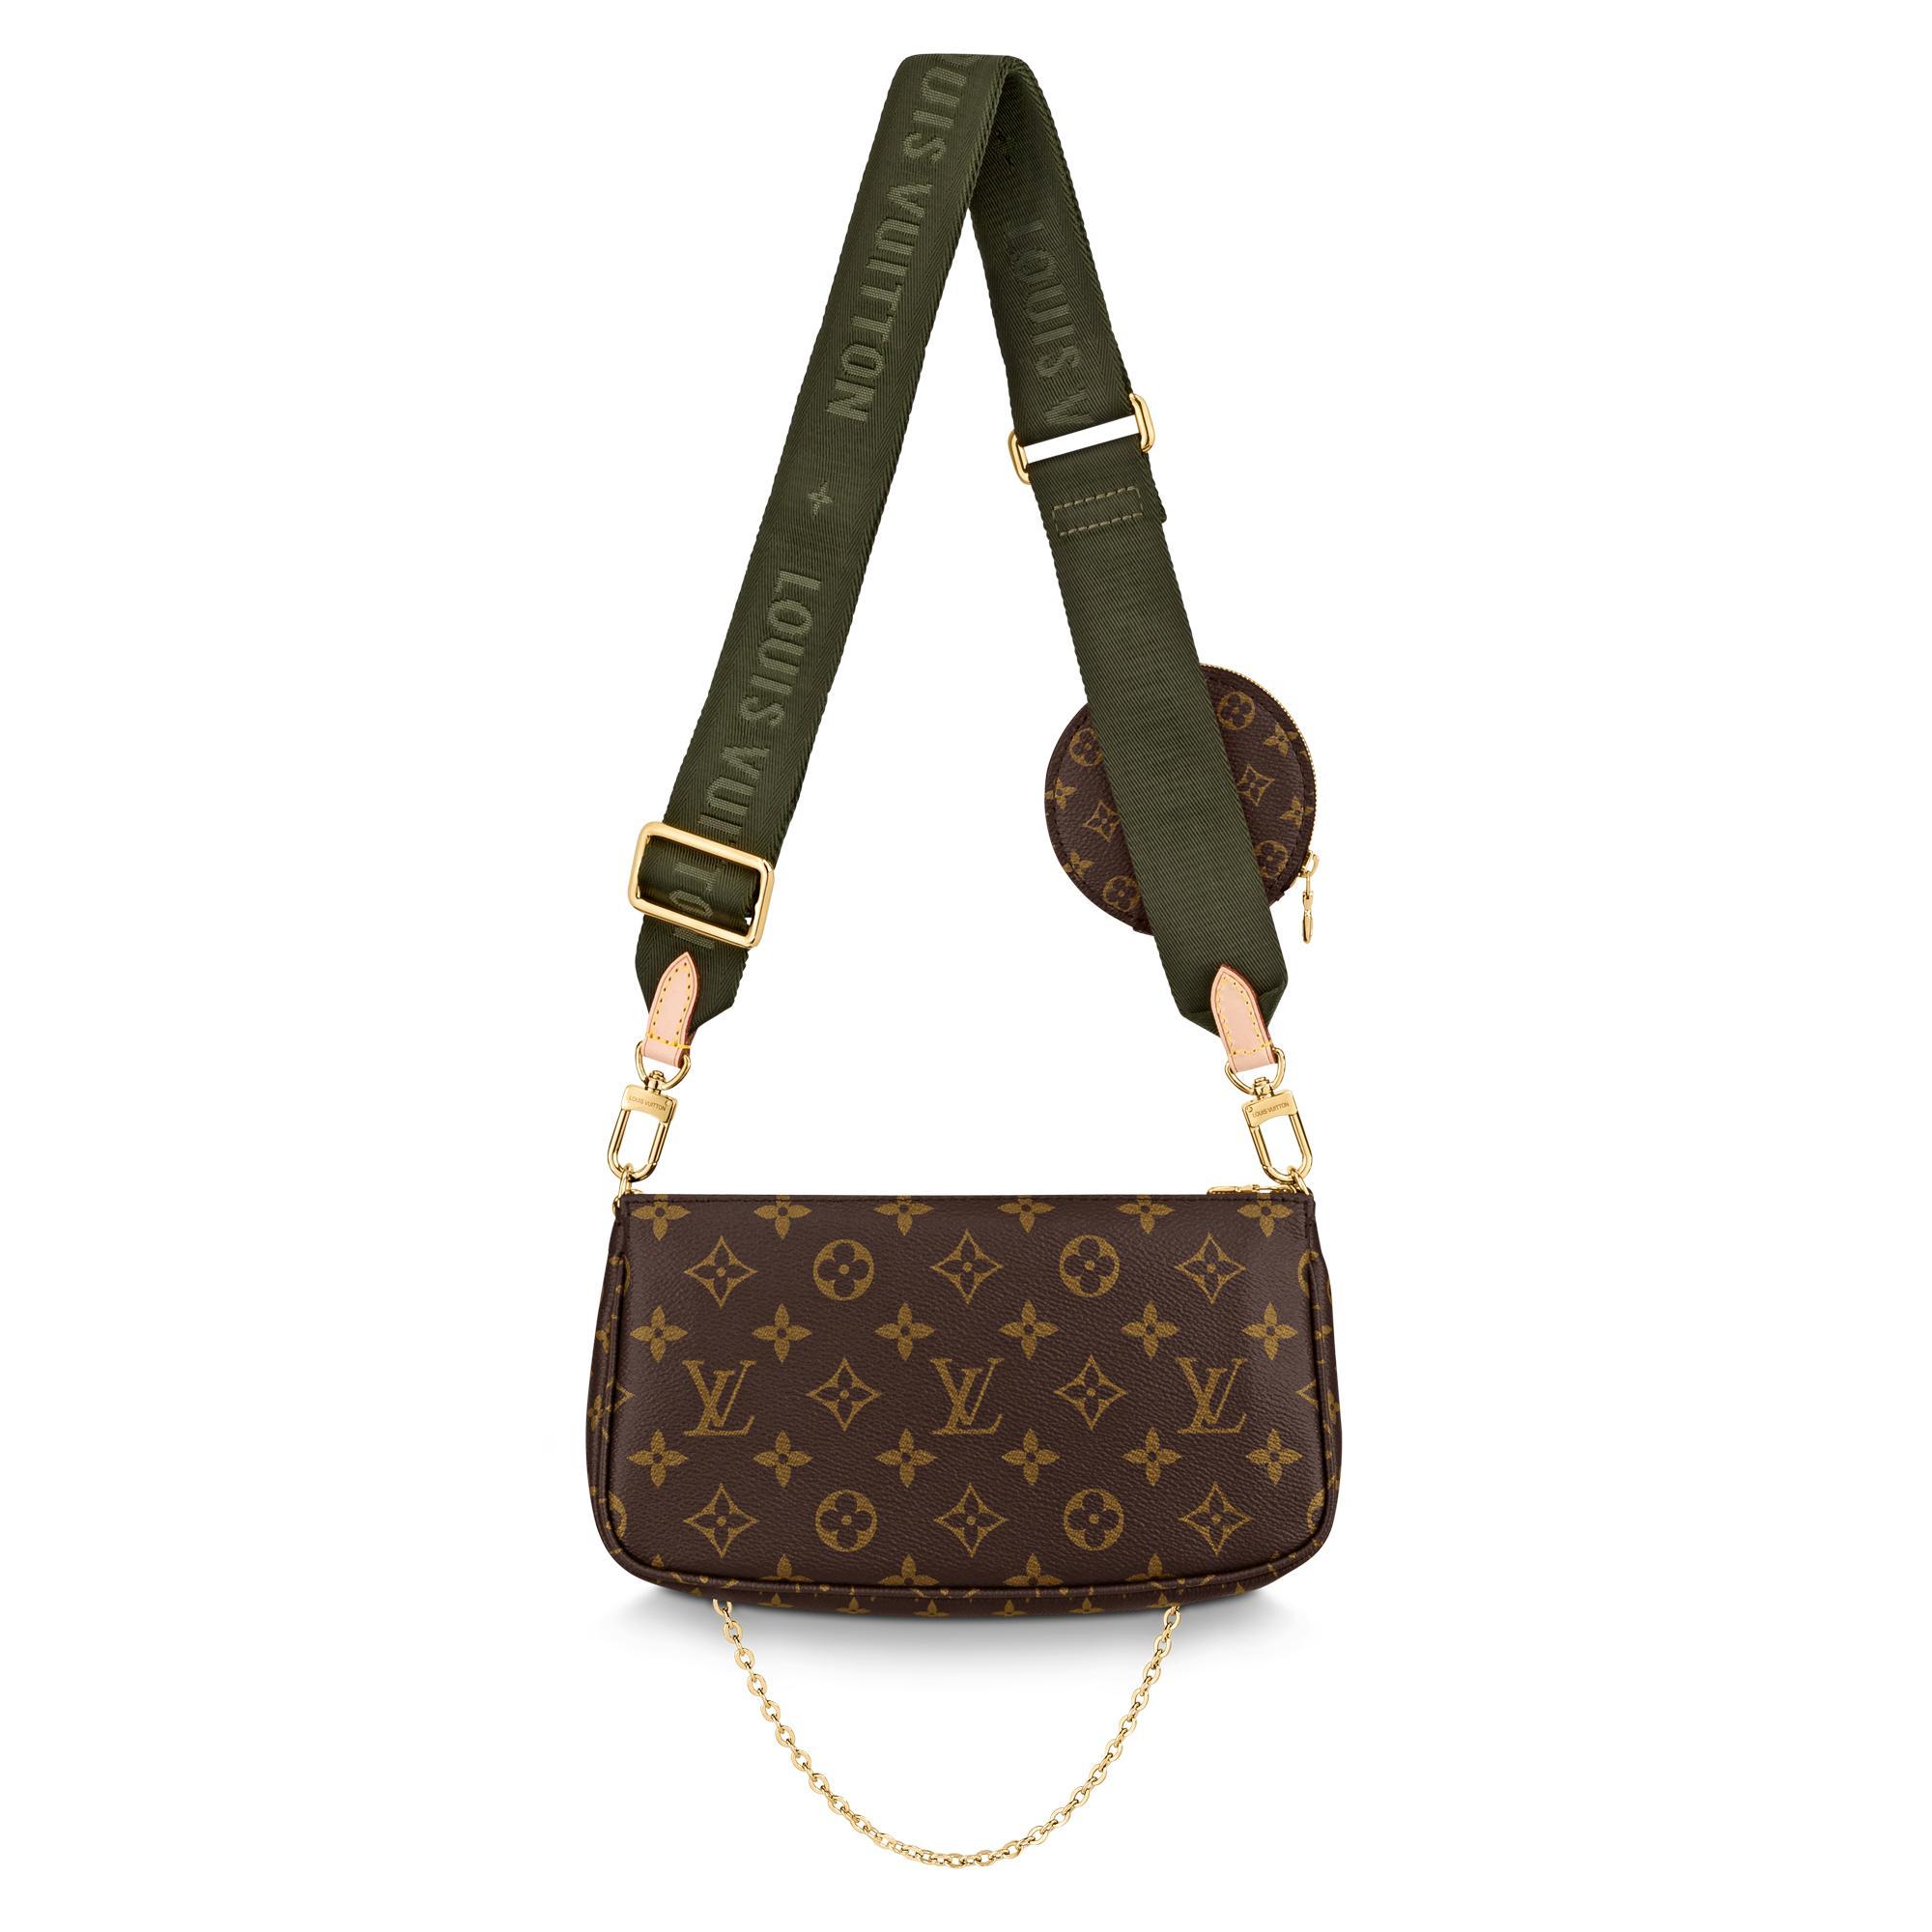 "Multi Pochette Bag"" Louis Vuitton"